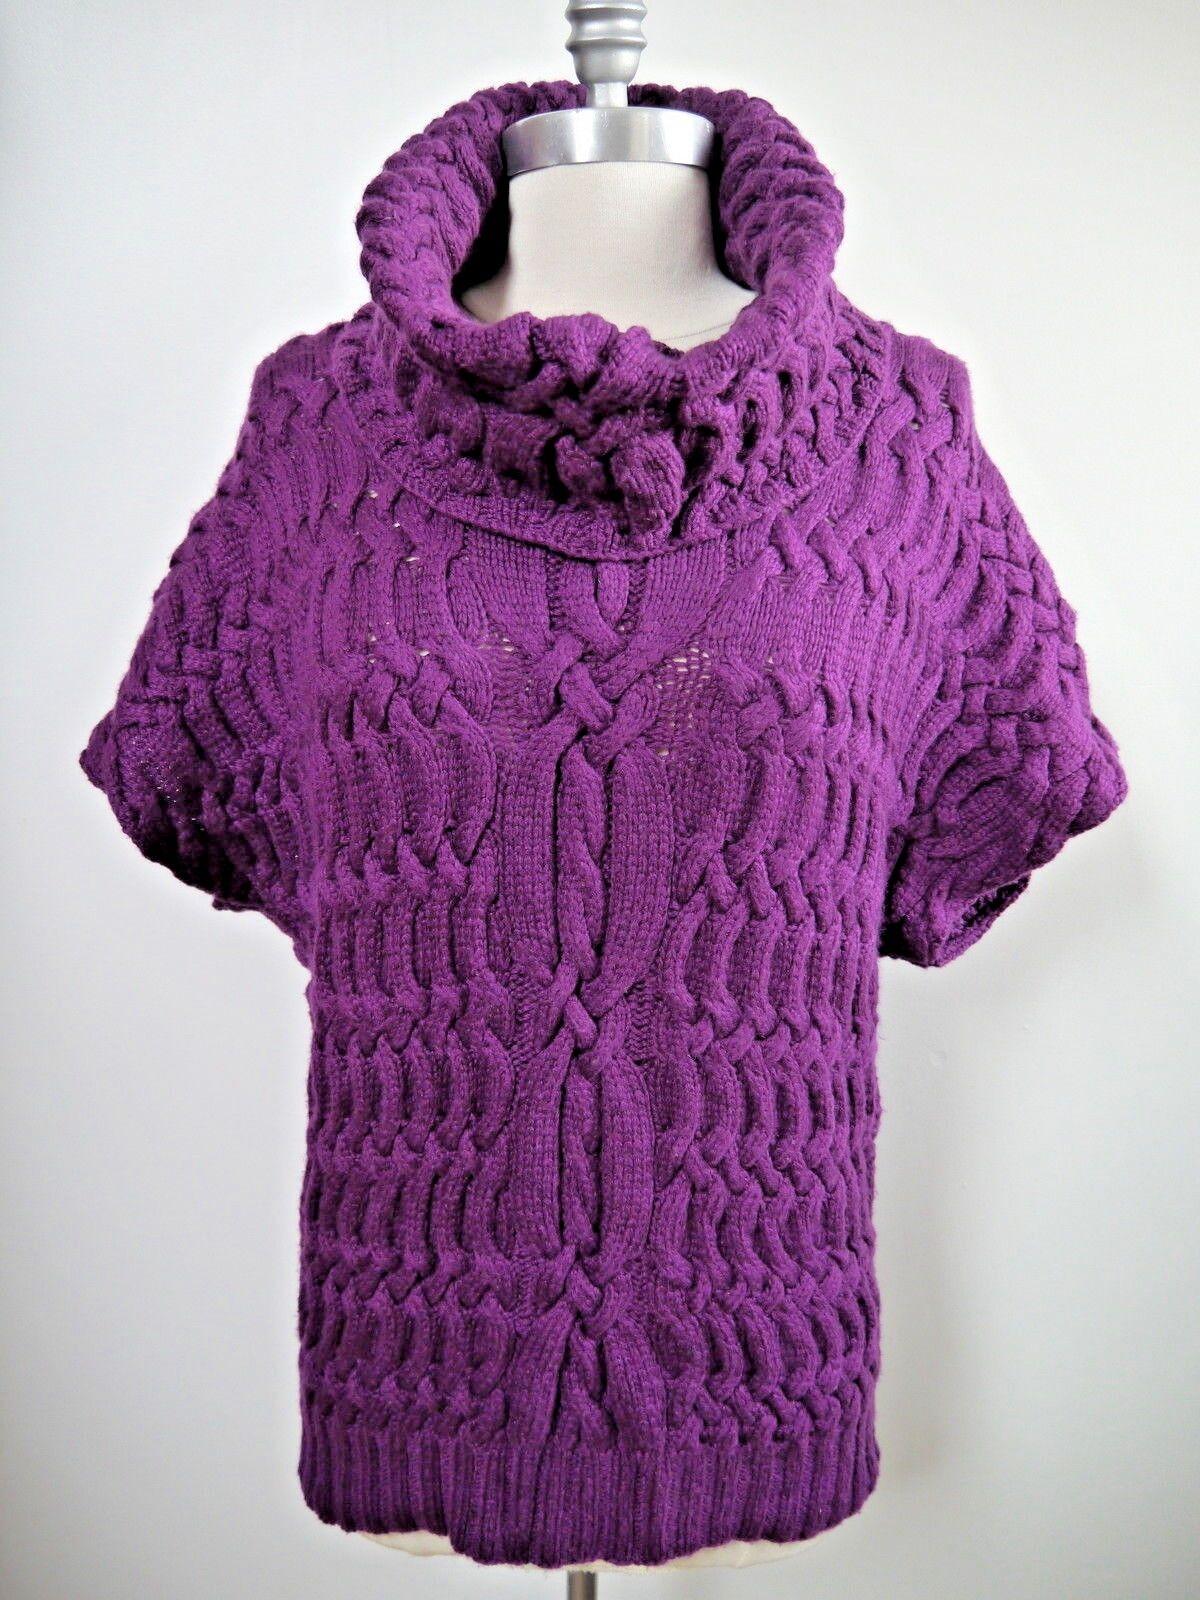 OSCAR DE LA RENTA k chunky 8 ply 100% cashmere sweater size small WORN ONCE